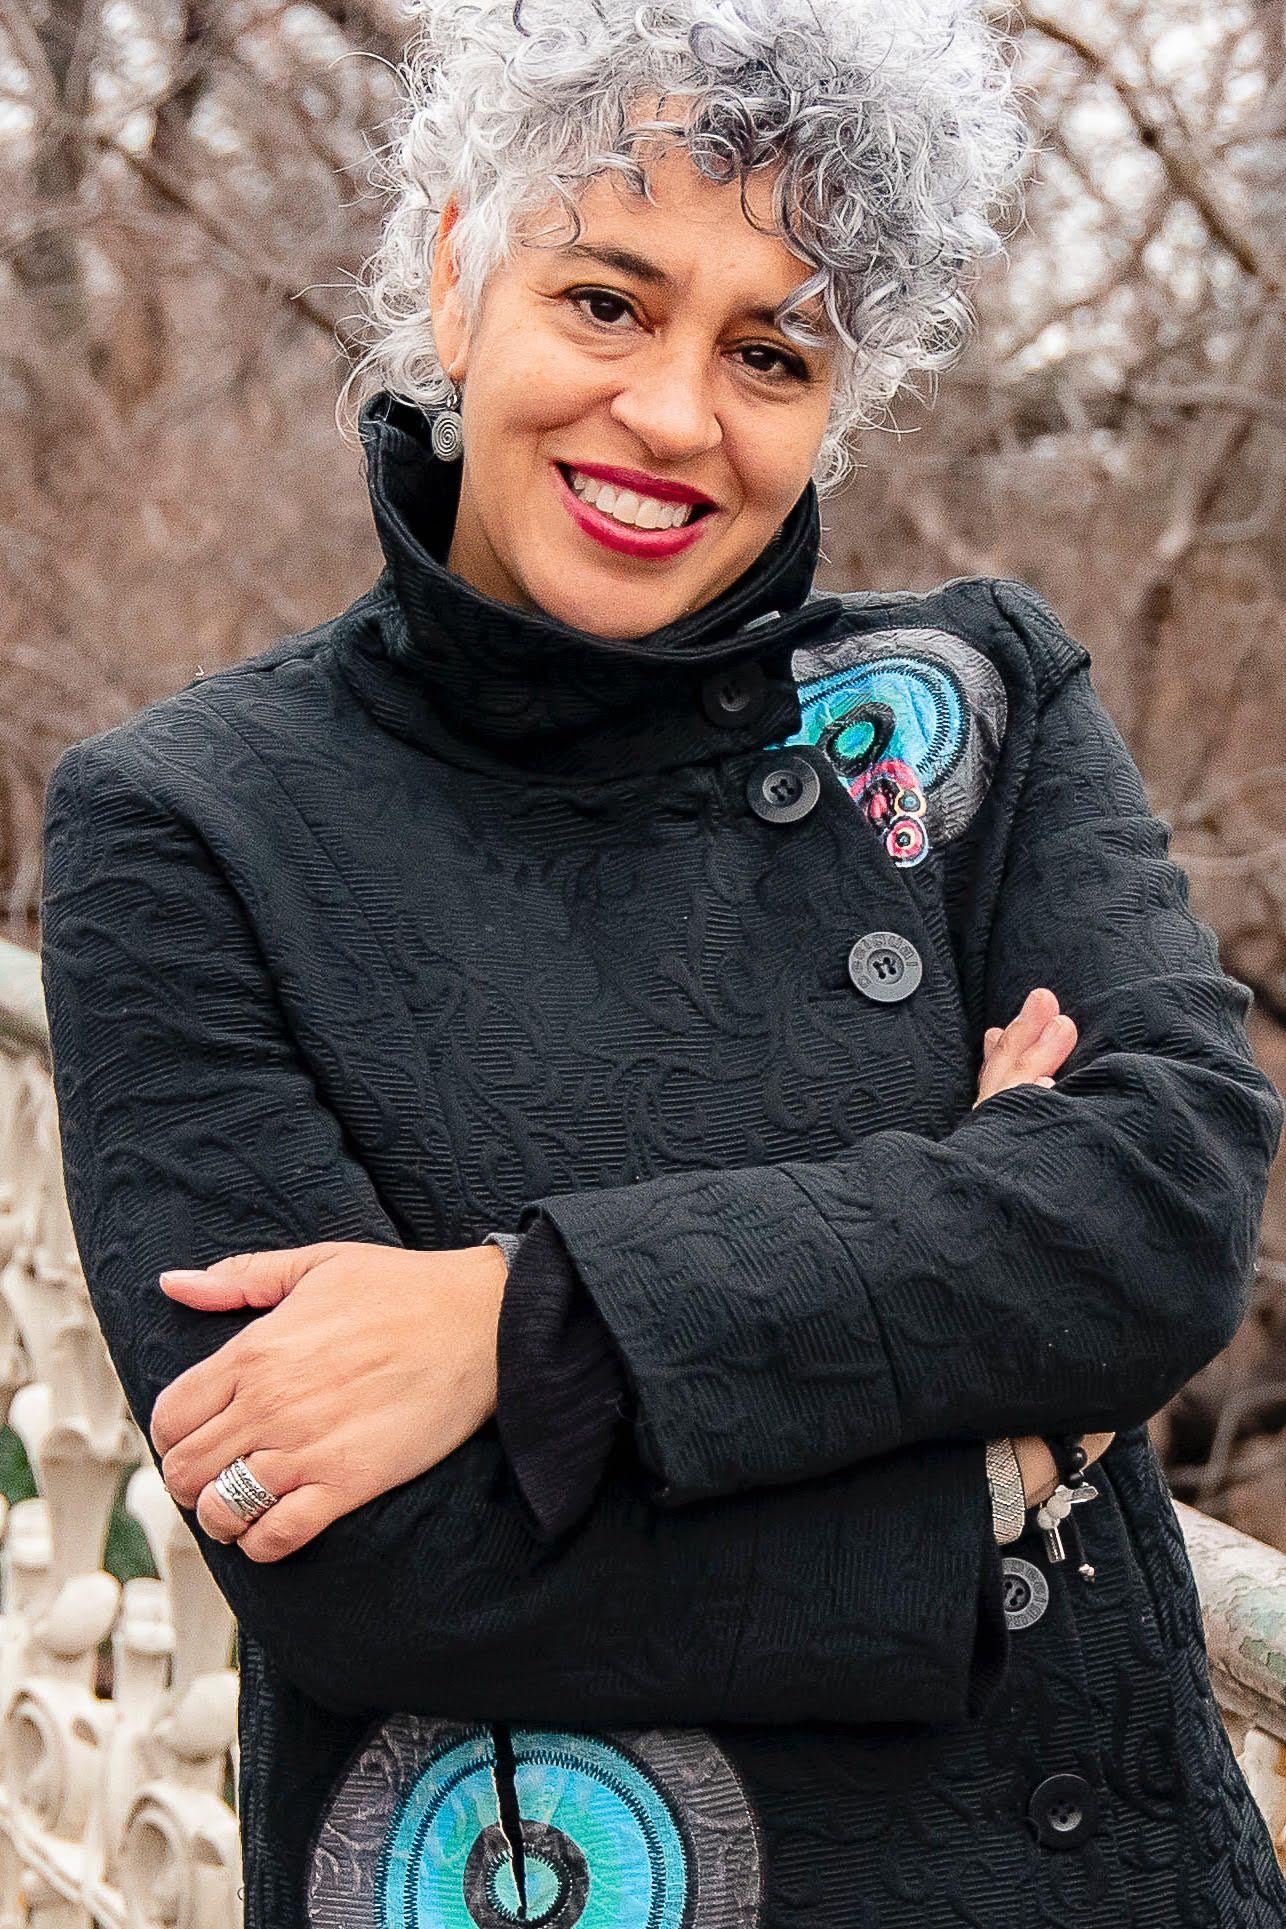 Activism in Adoption Speaker Series: Introducing Pamela Cook